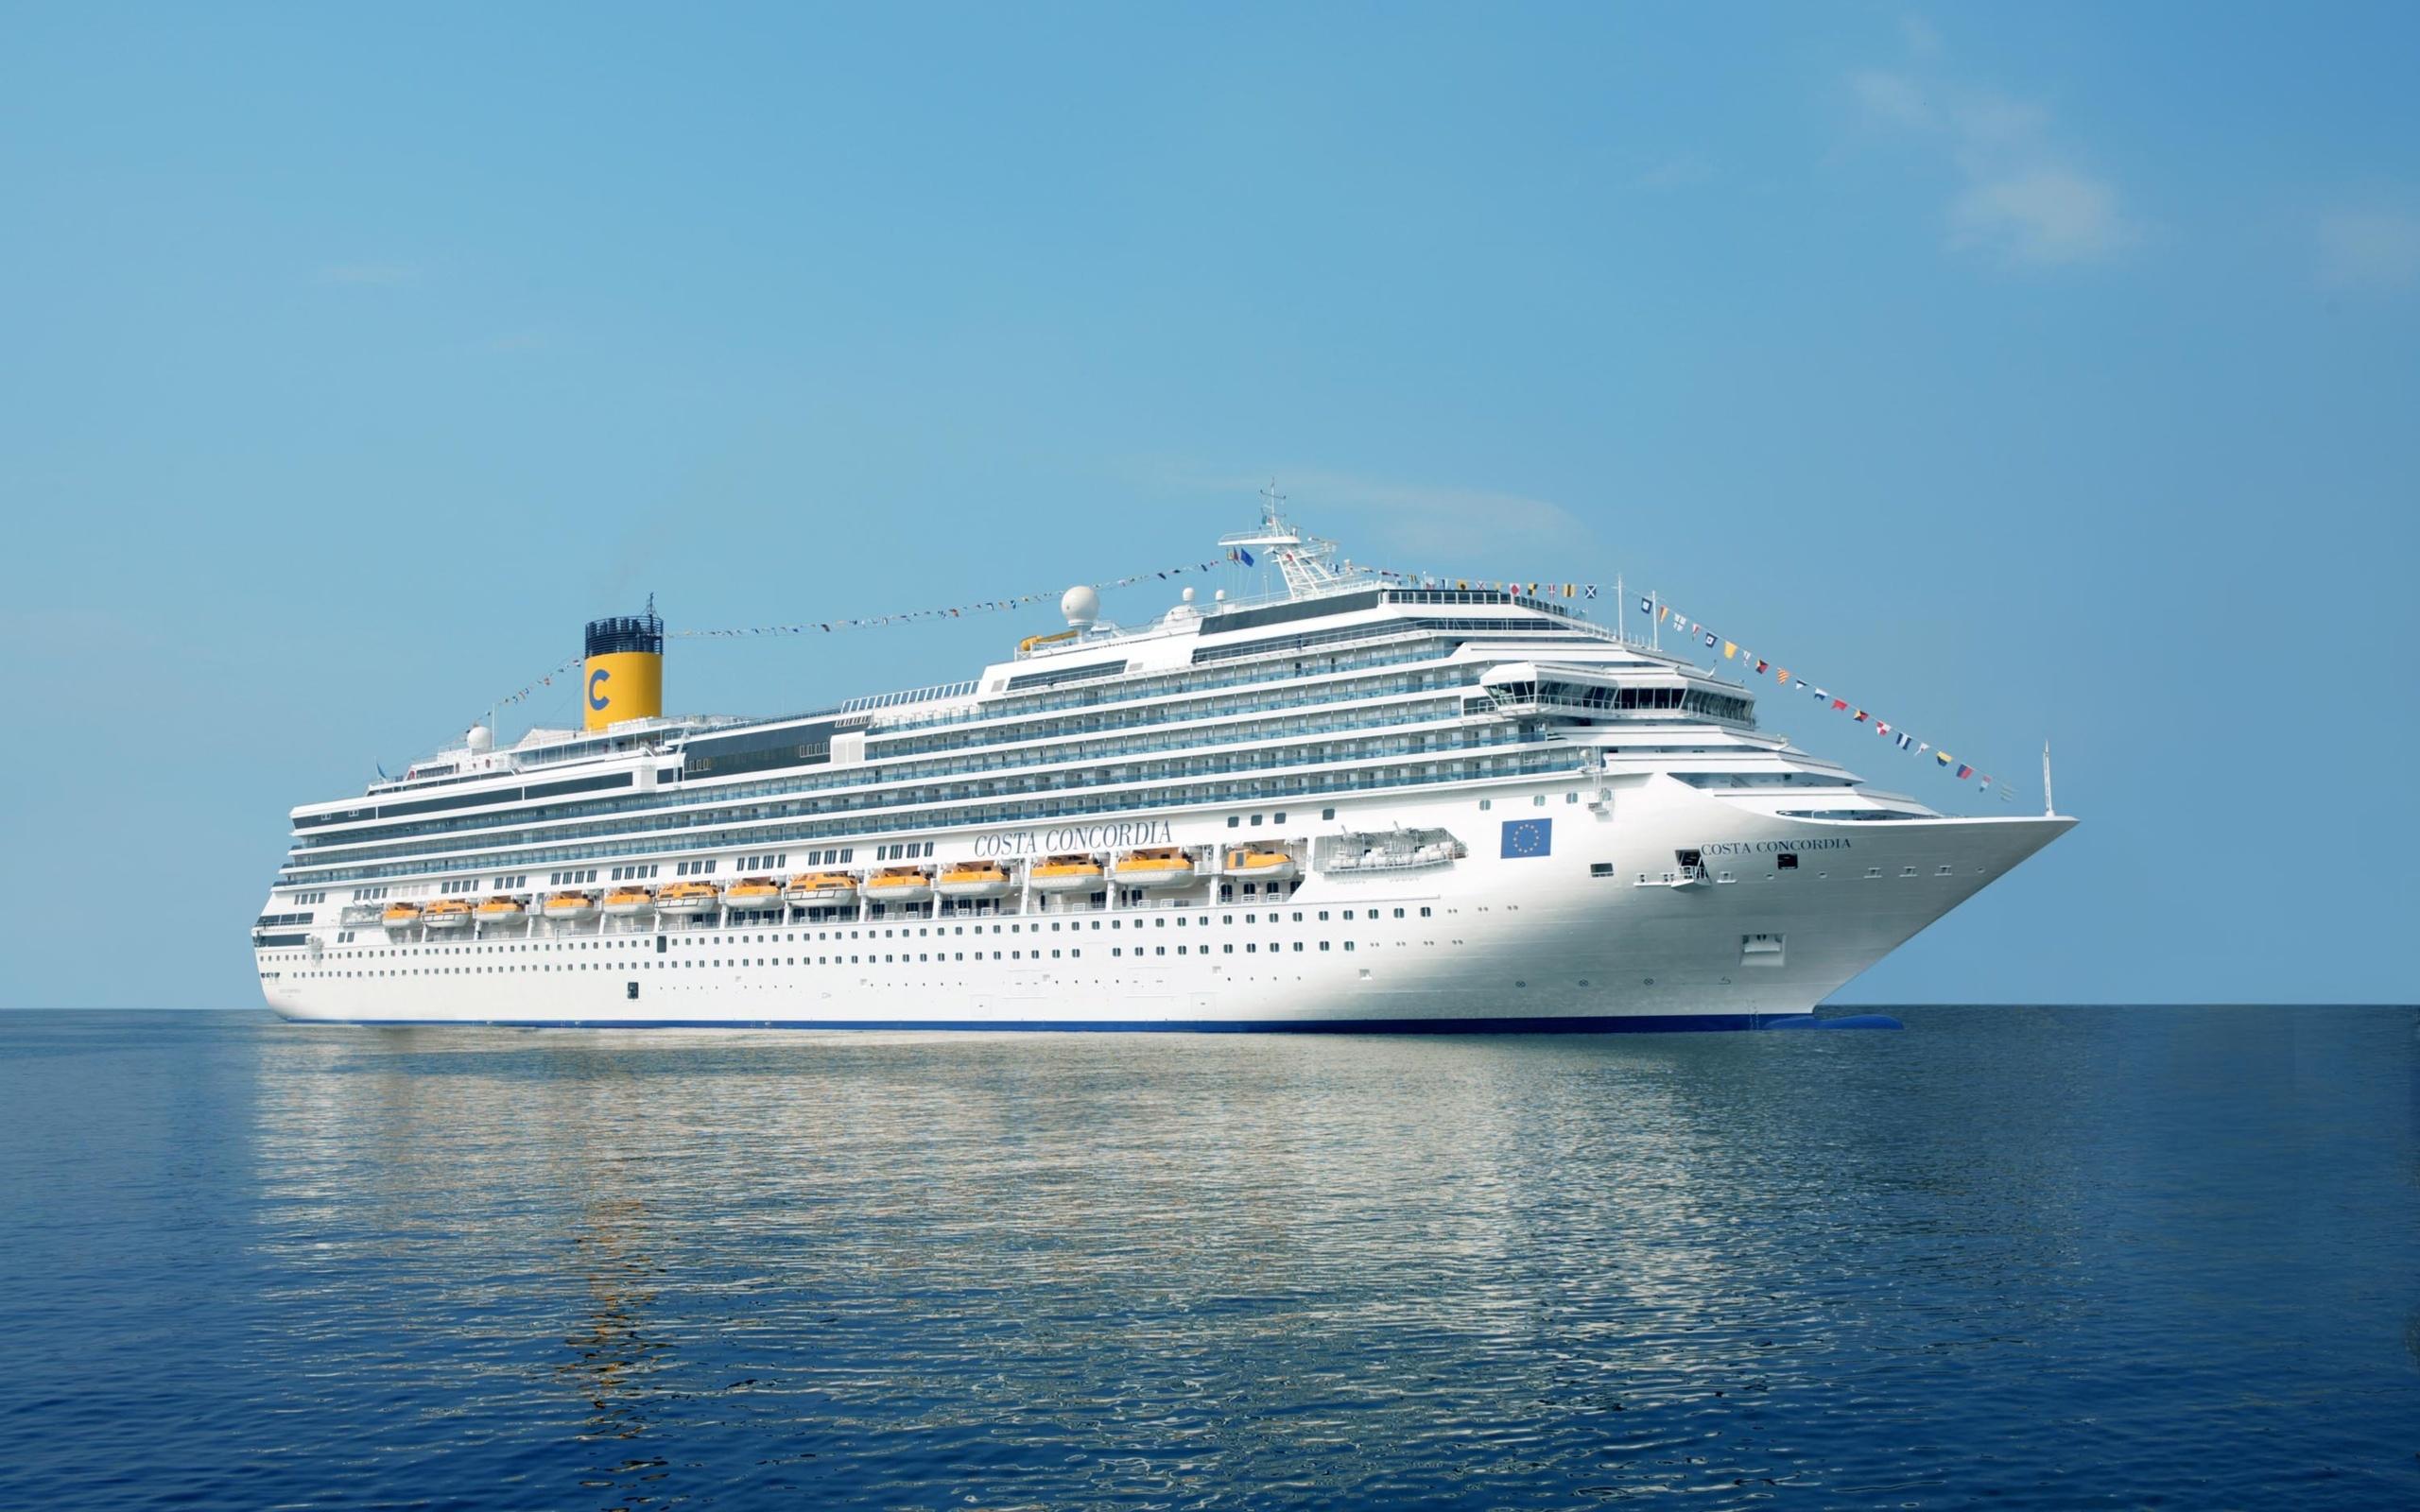 cruise ship wide wallpaper 62624